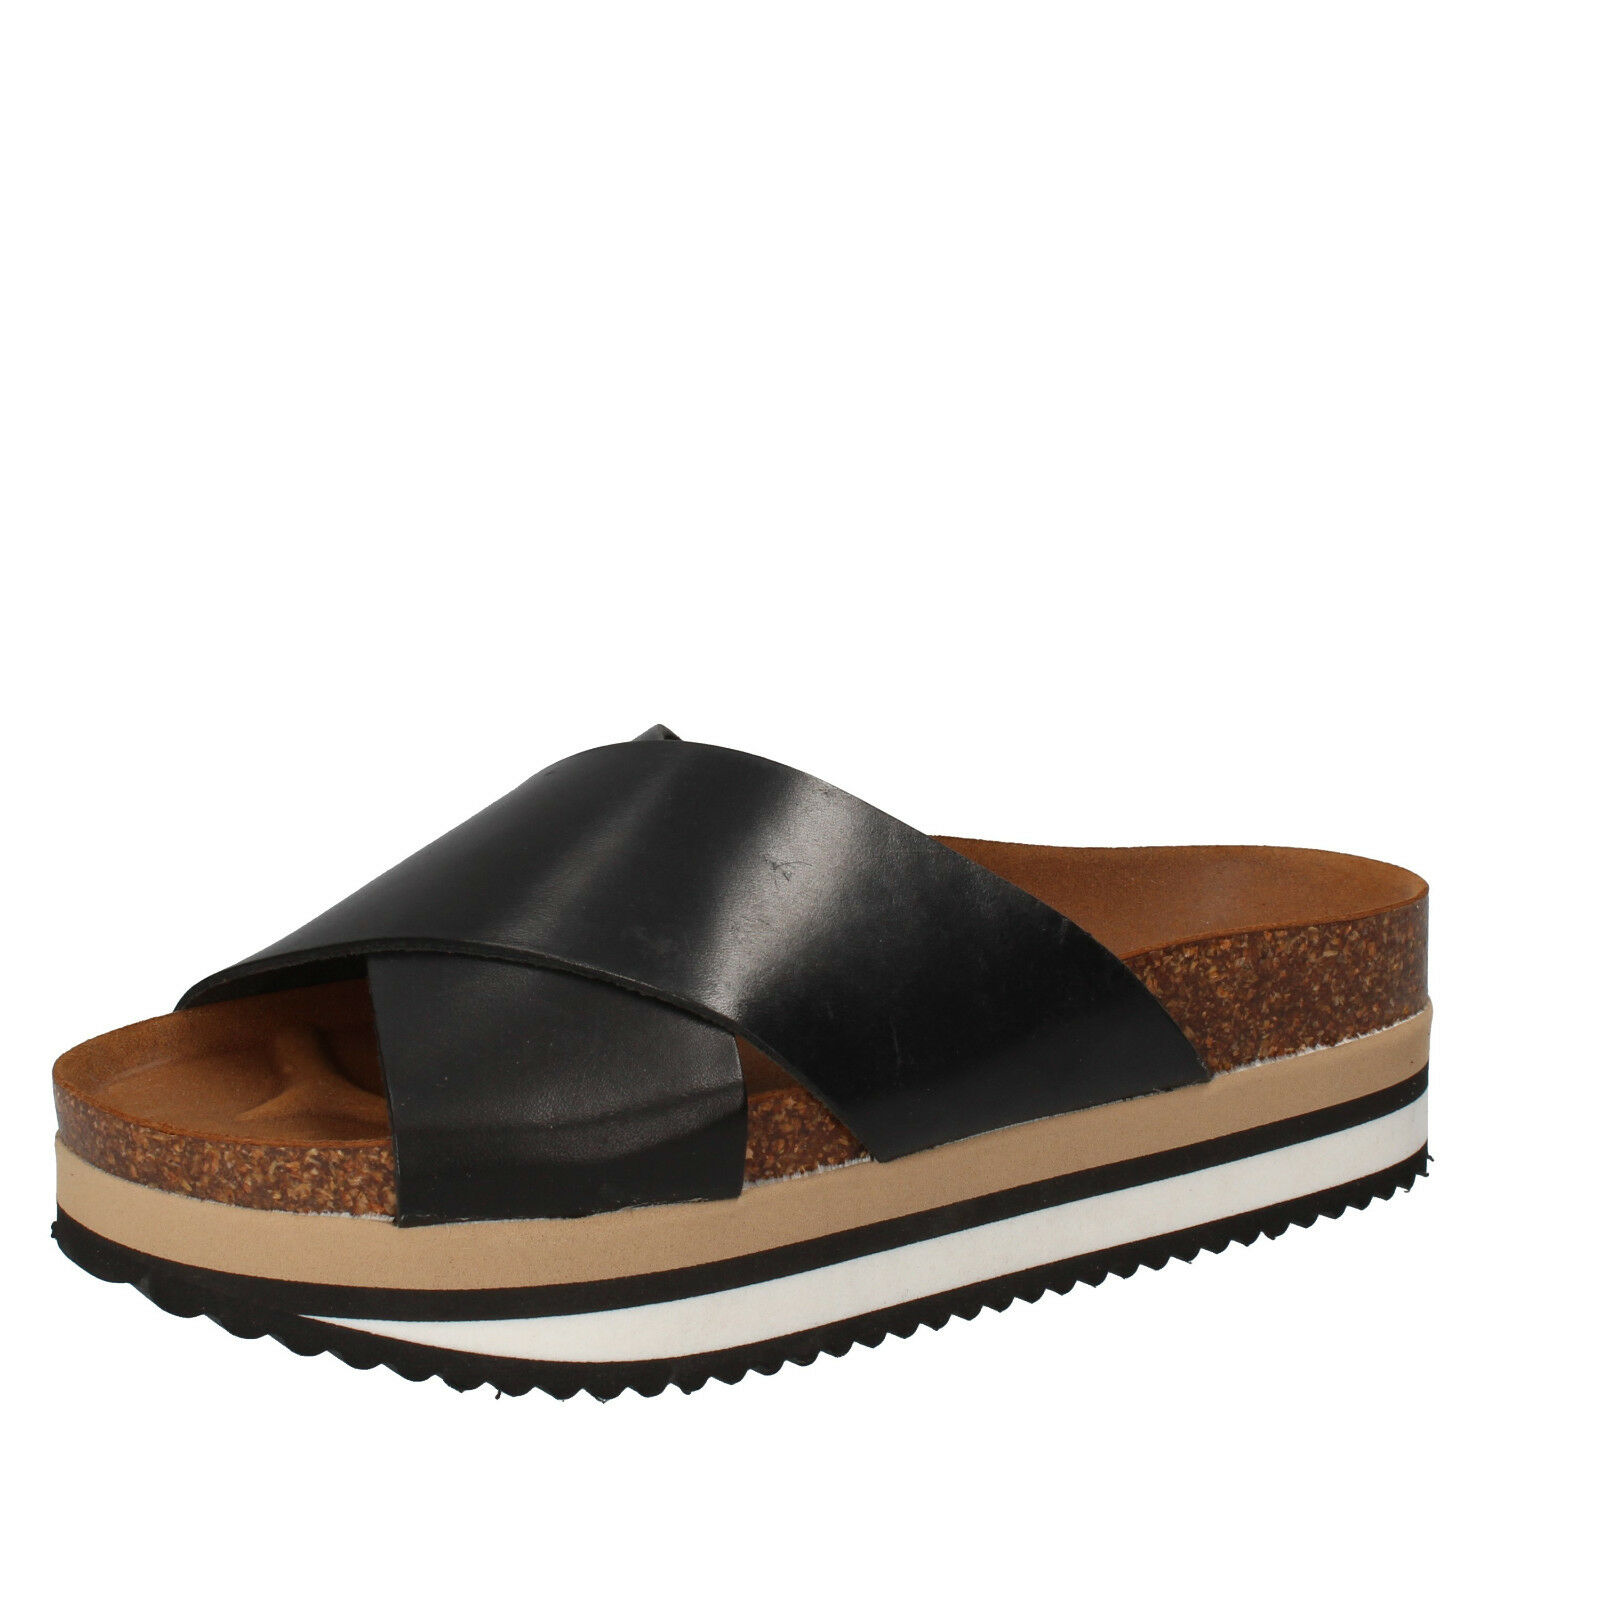 Scarpe donna 5 PRO JECT 37 AC696-C EU sandali nero pelle AC696-C 37 0aafb3